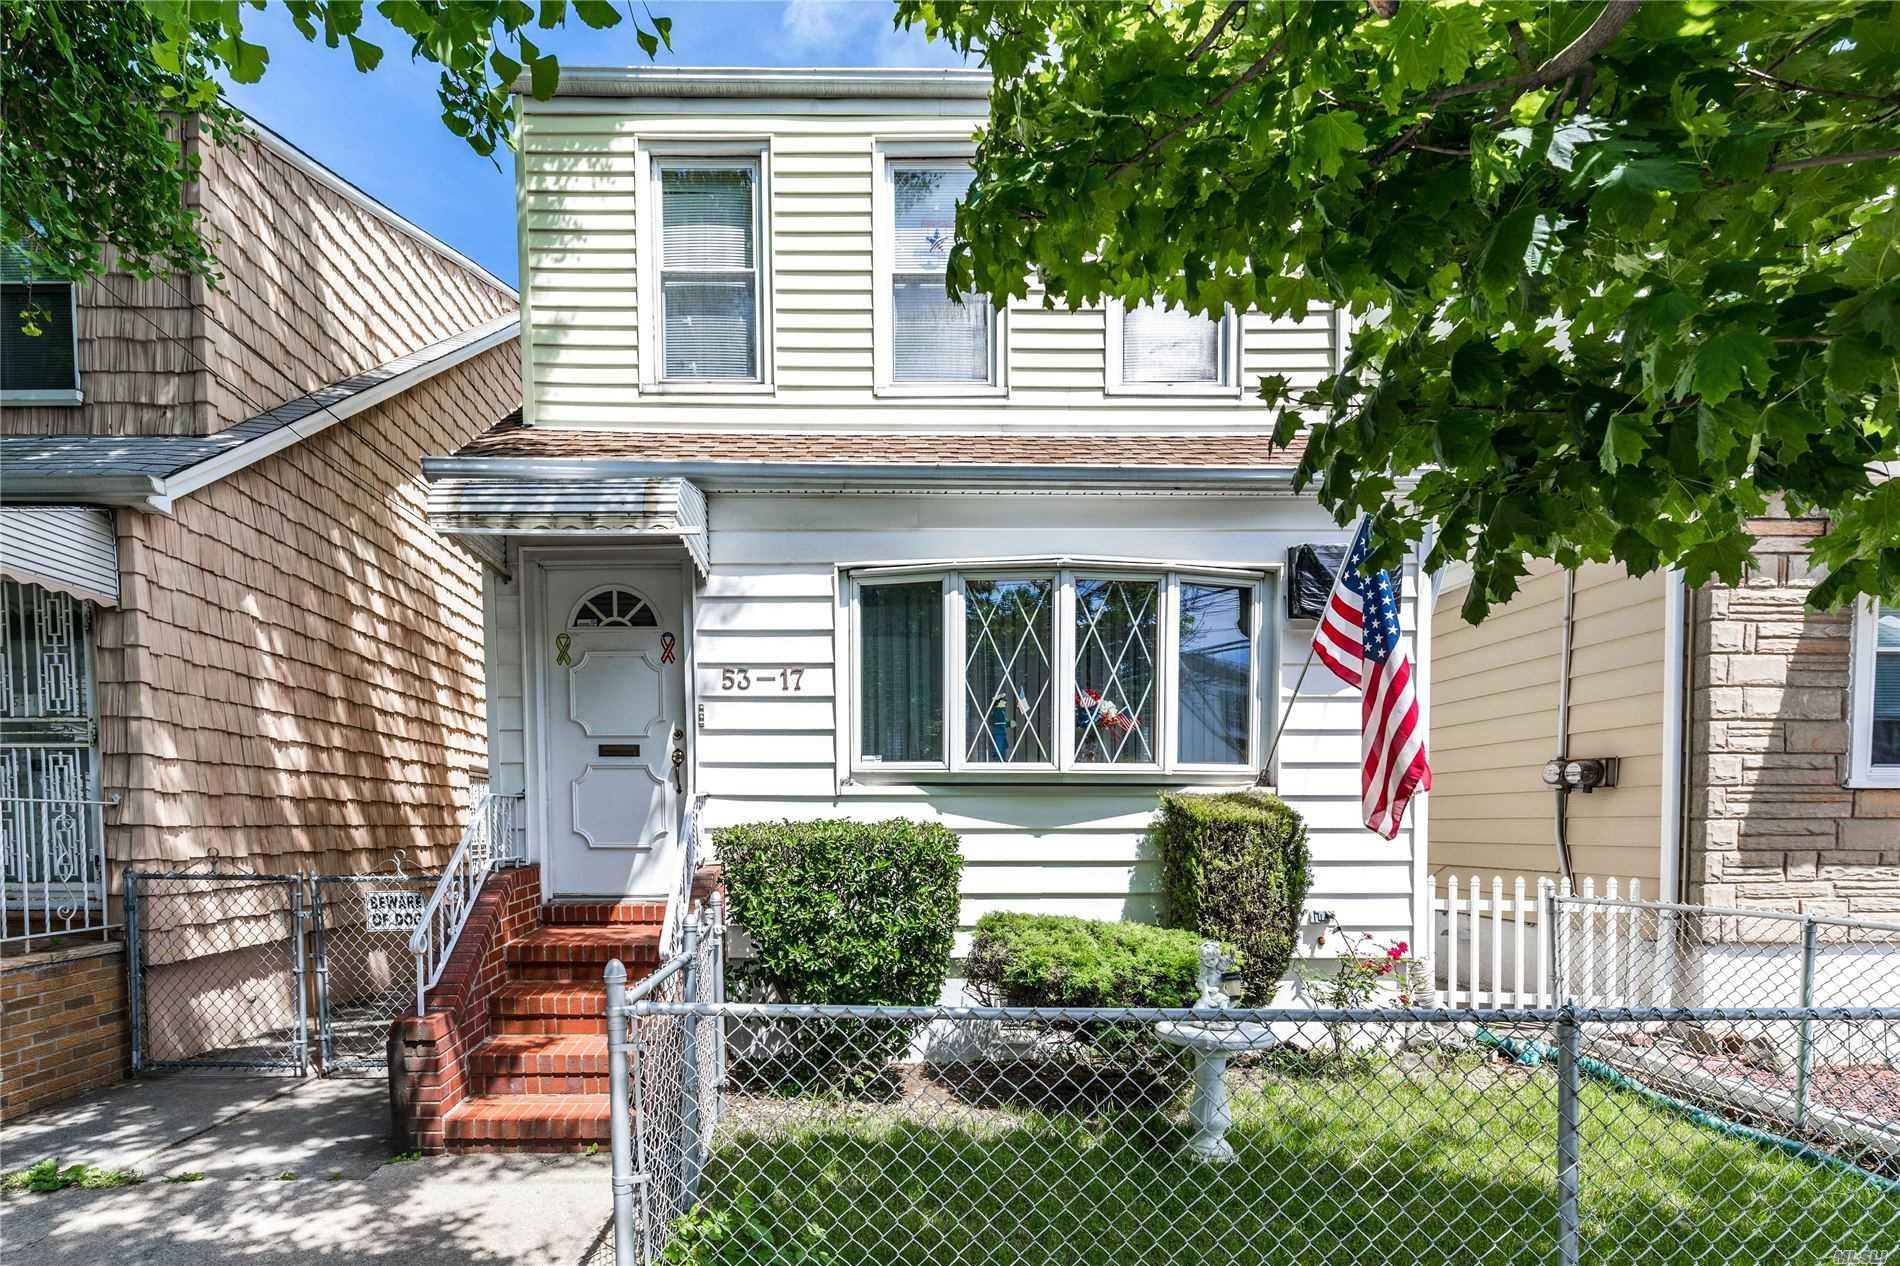 Property for sale at 53-17 73 St, Maspeth NY 11378, Maspeth,  New York 11378